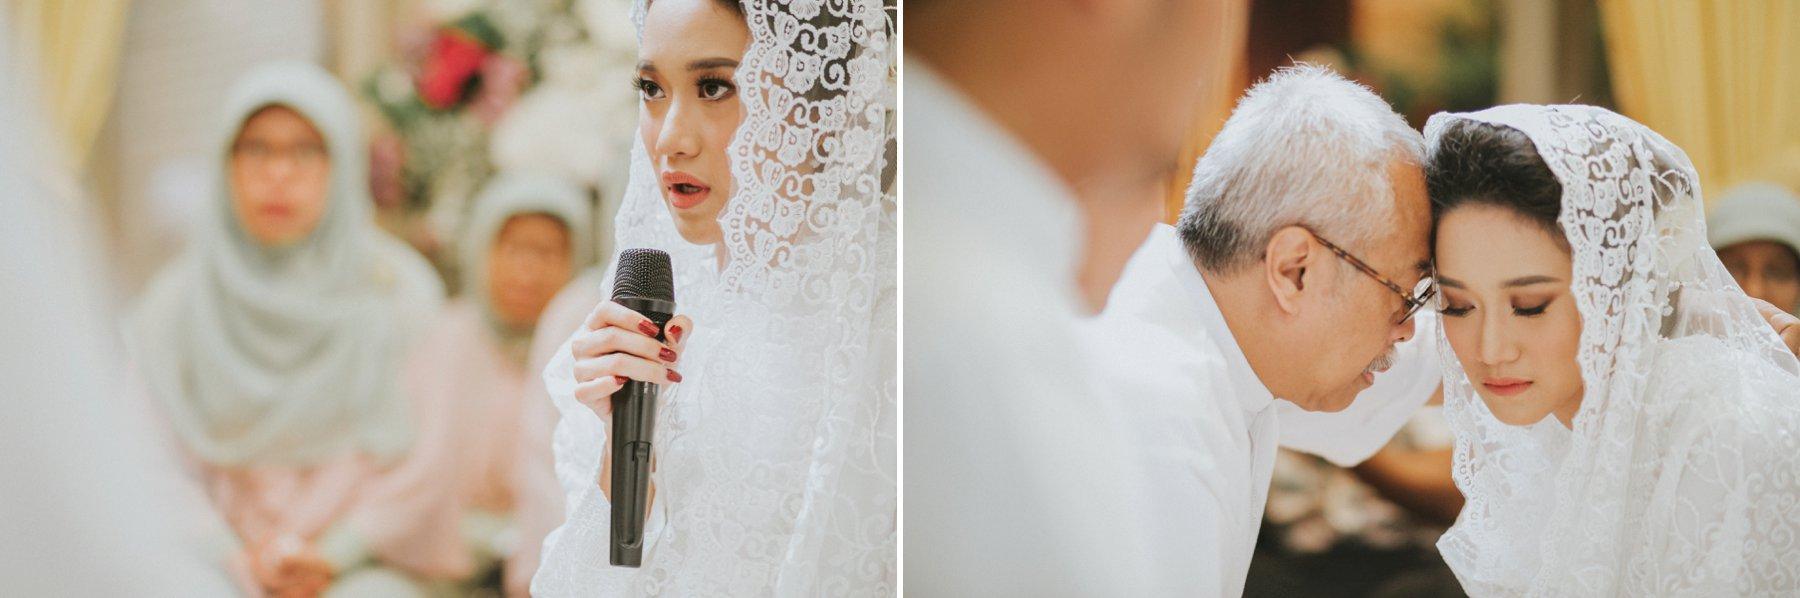 Sampoerna_Strategic_Wedding_Antijitters_Photo_0004